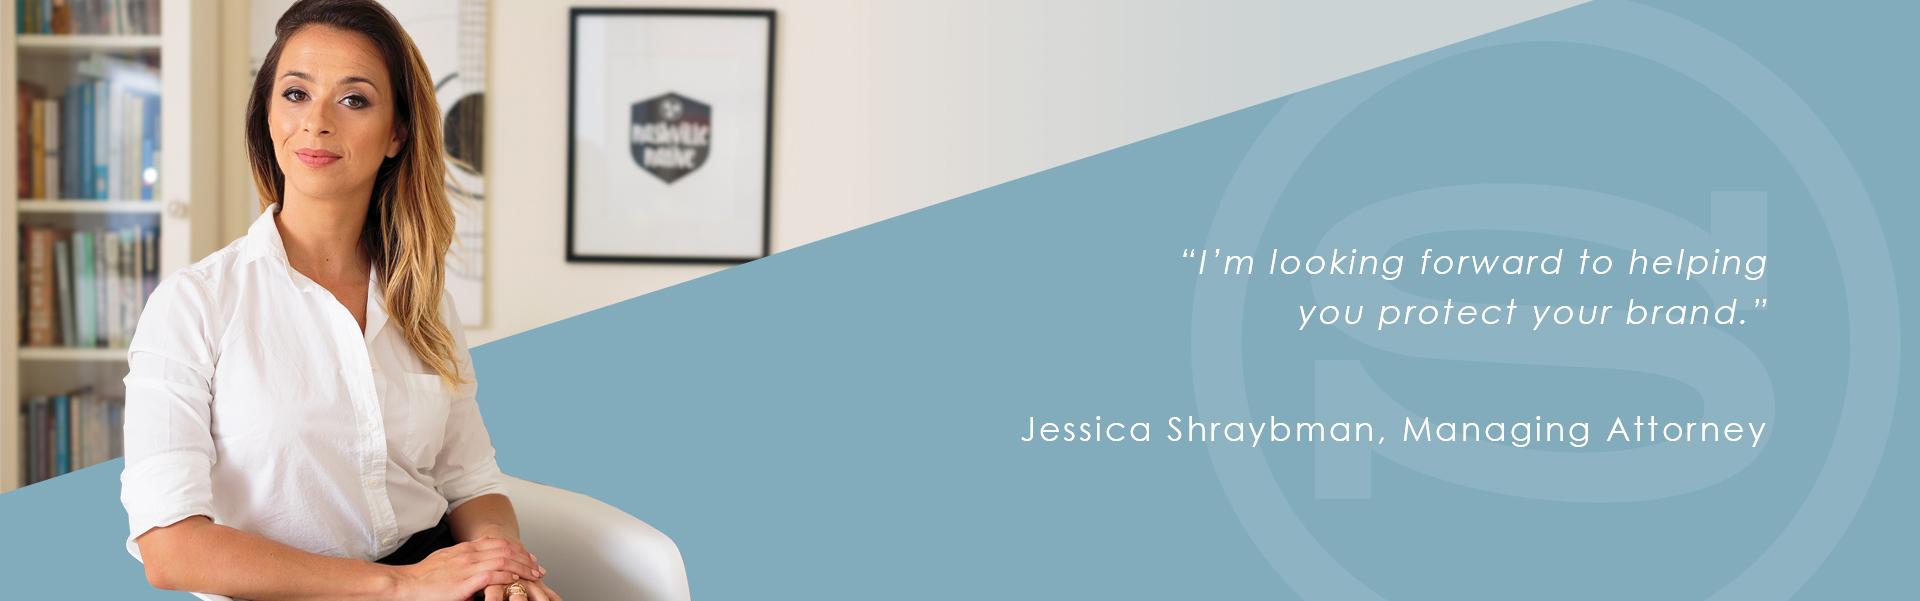 Jessica_quote_4.jpg